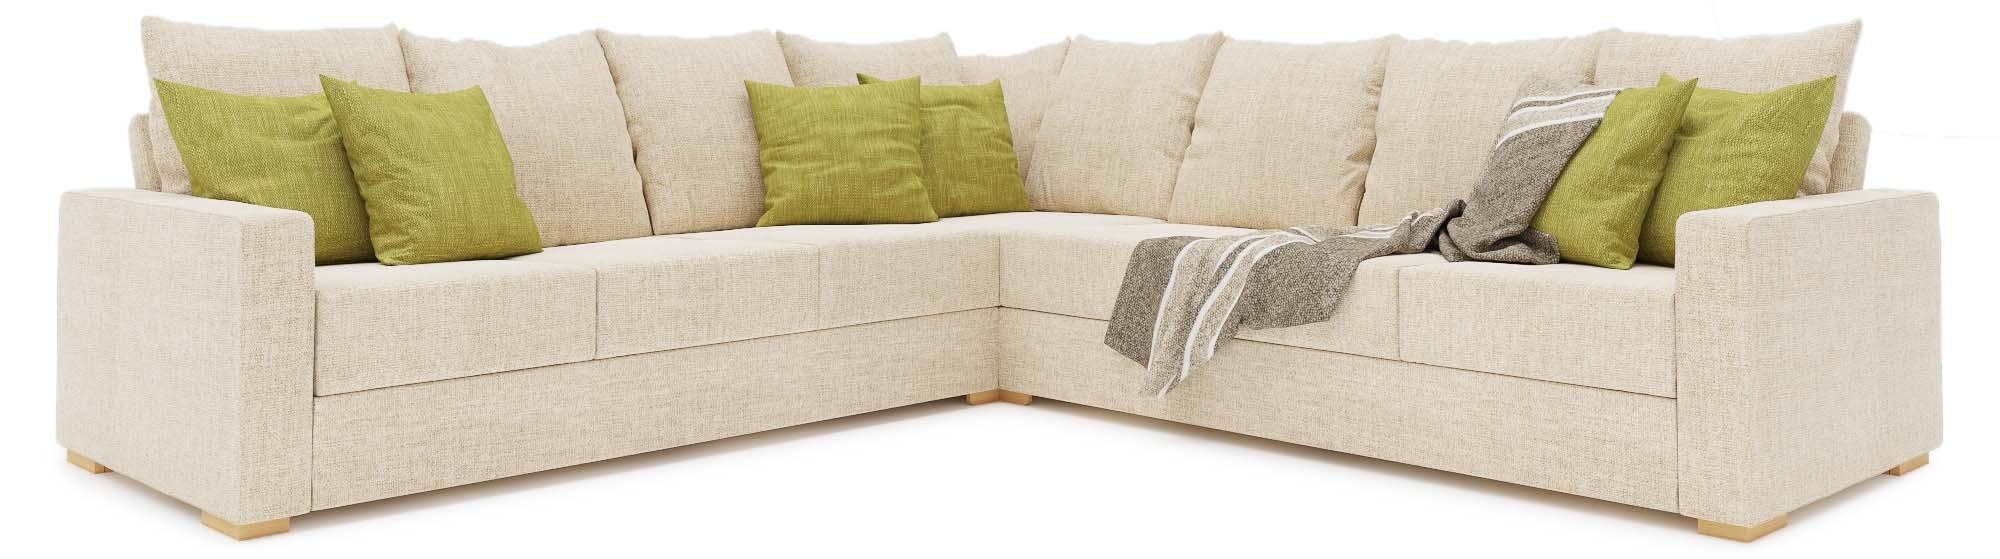 Tor 4X4 Corner Double Sofa Bed